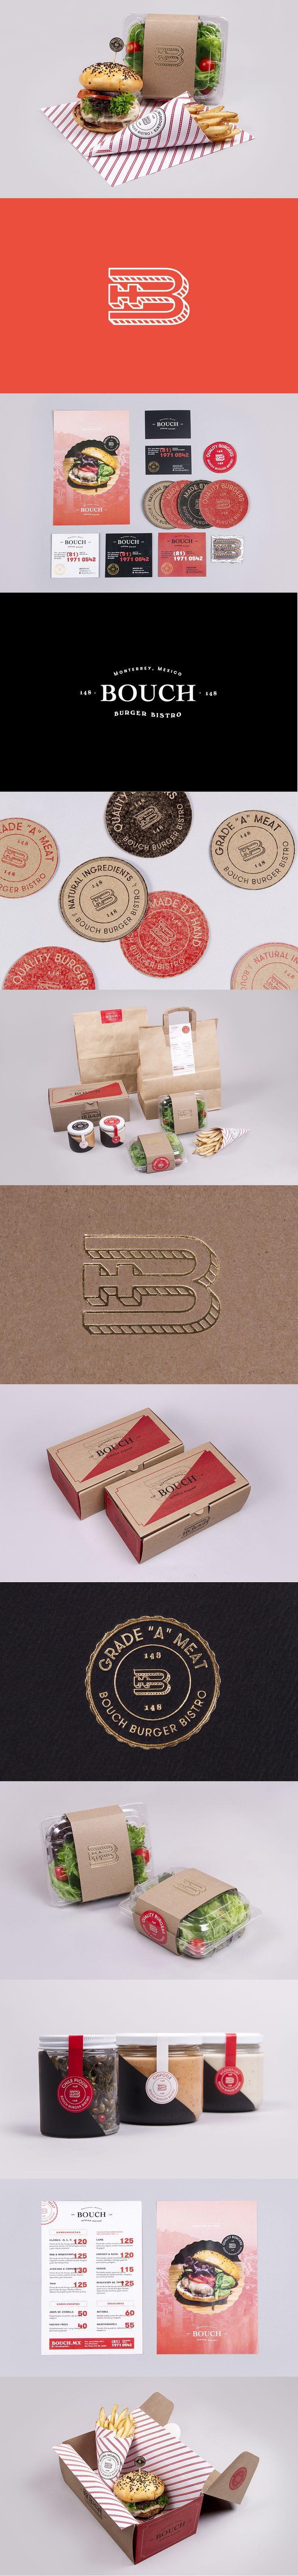 Bouch Burger Bistro. Who want's a burger #identity #packaging #branding PD...muy parecido a algo que conozco.....